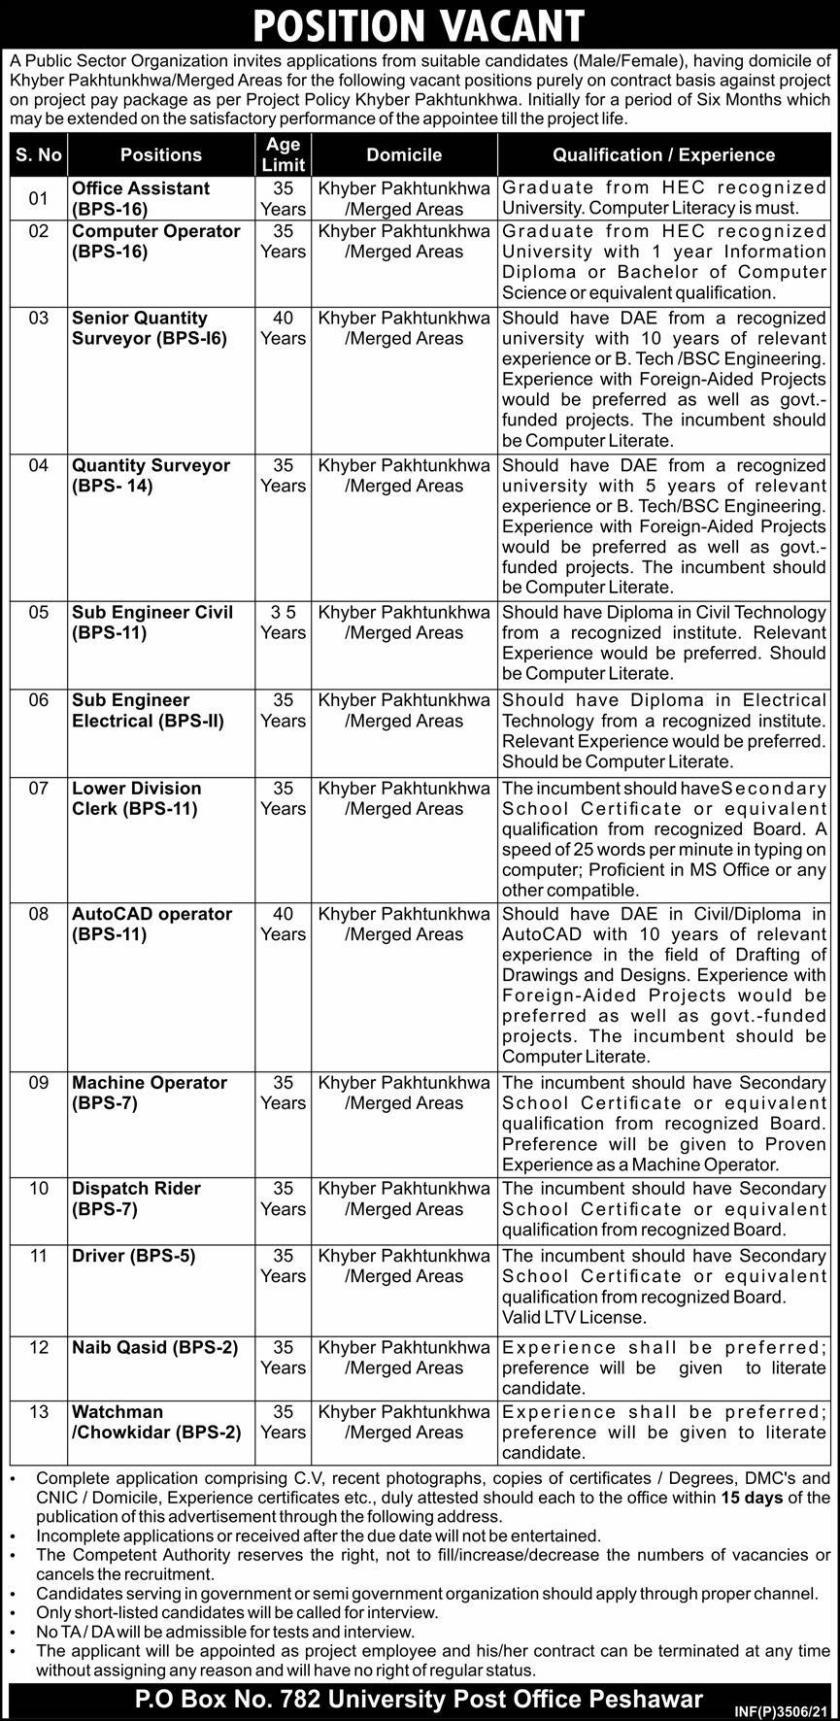 Public sector Organization PO Box 782 Peshawar Jobs 2021